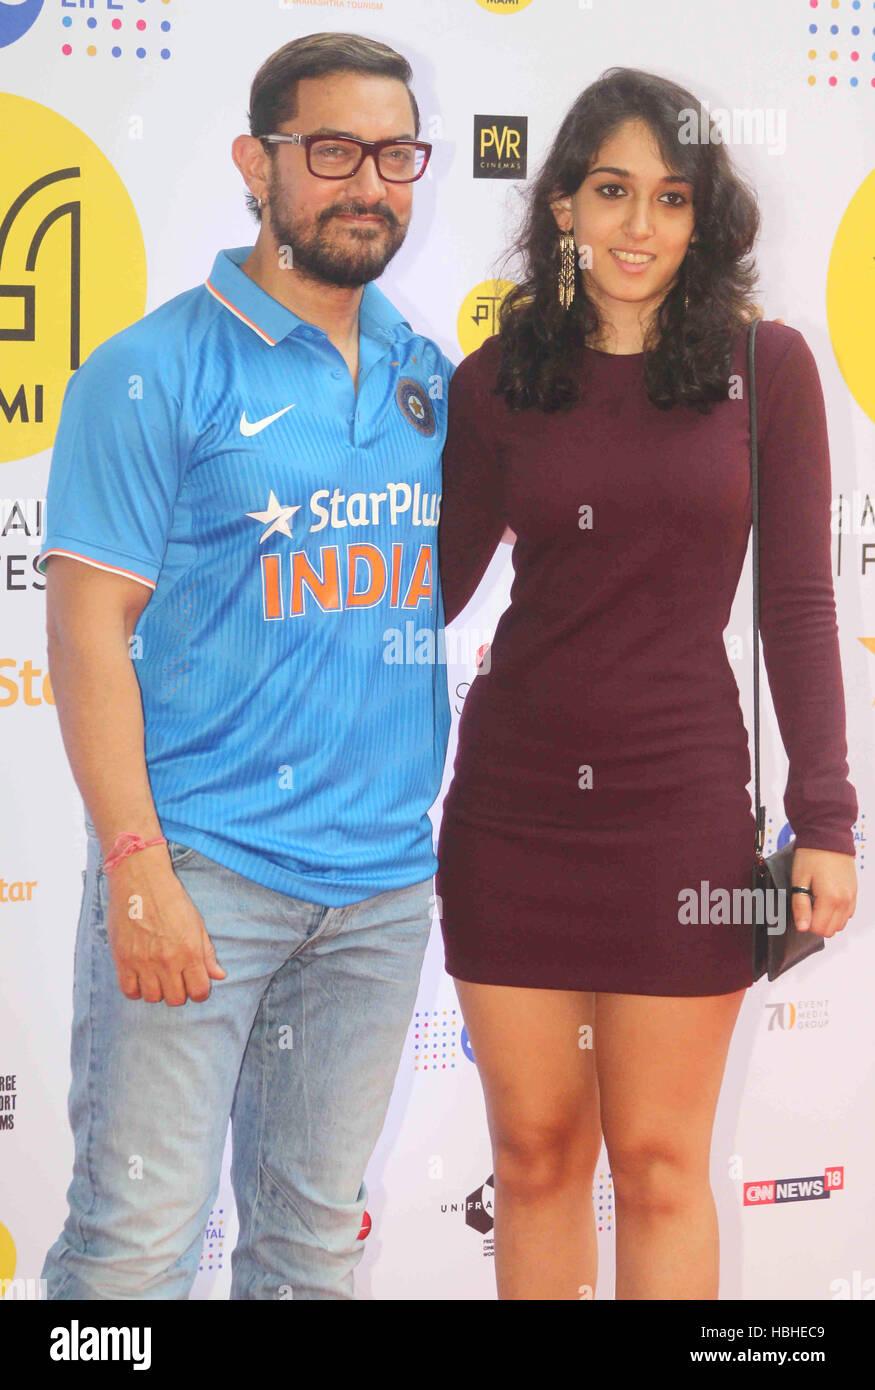 Bollywood actor Aamir Khan Ira Khan Rewind with Jo Jeeta Wohi Sikandar during the Jio MAMI 18th Mumbai Film Festival - Stock Image